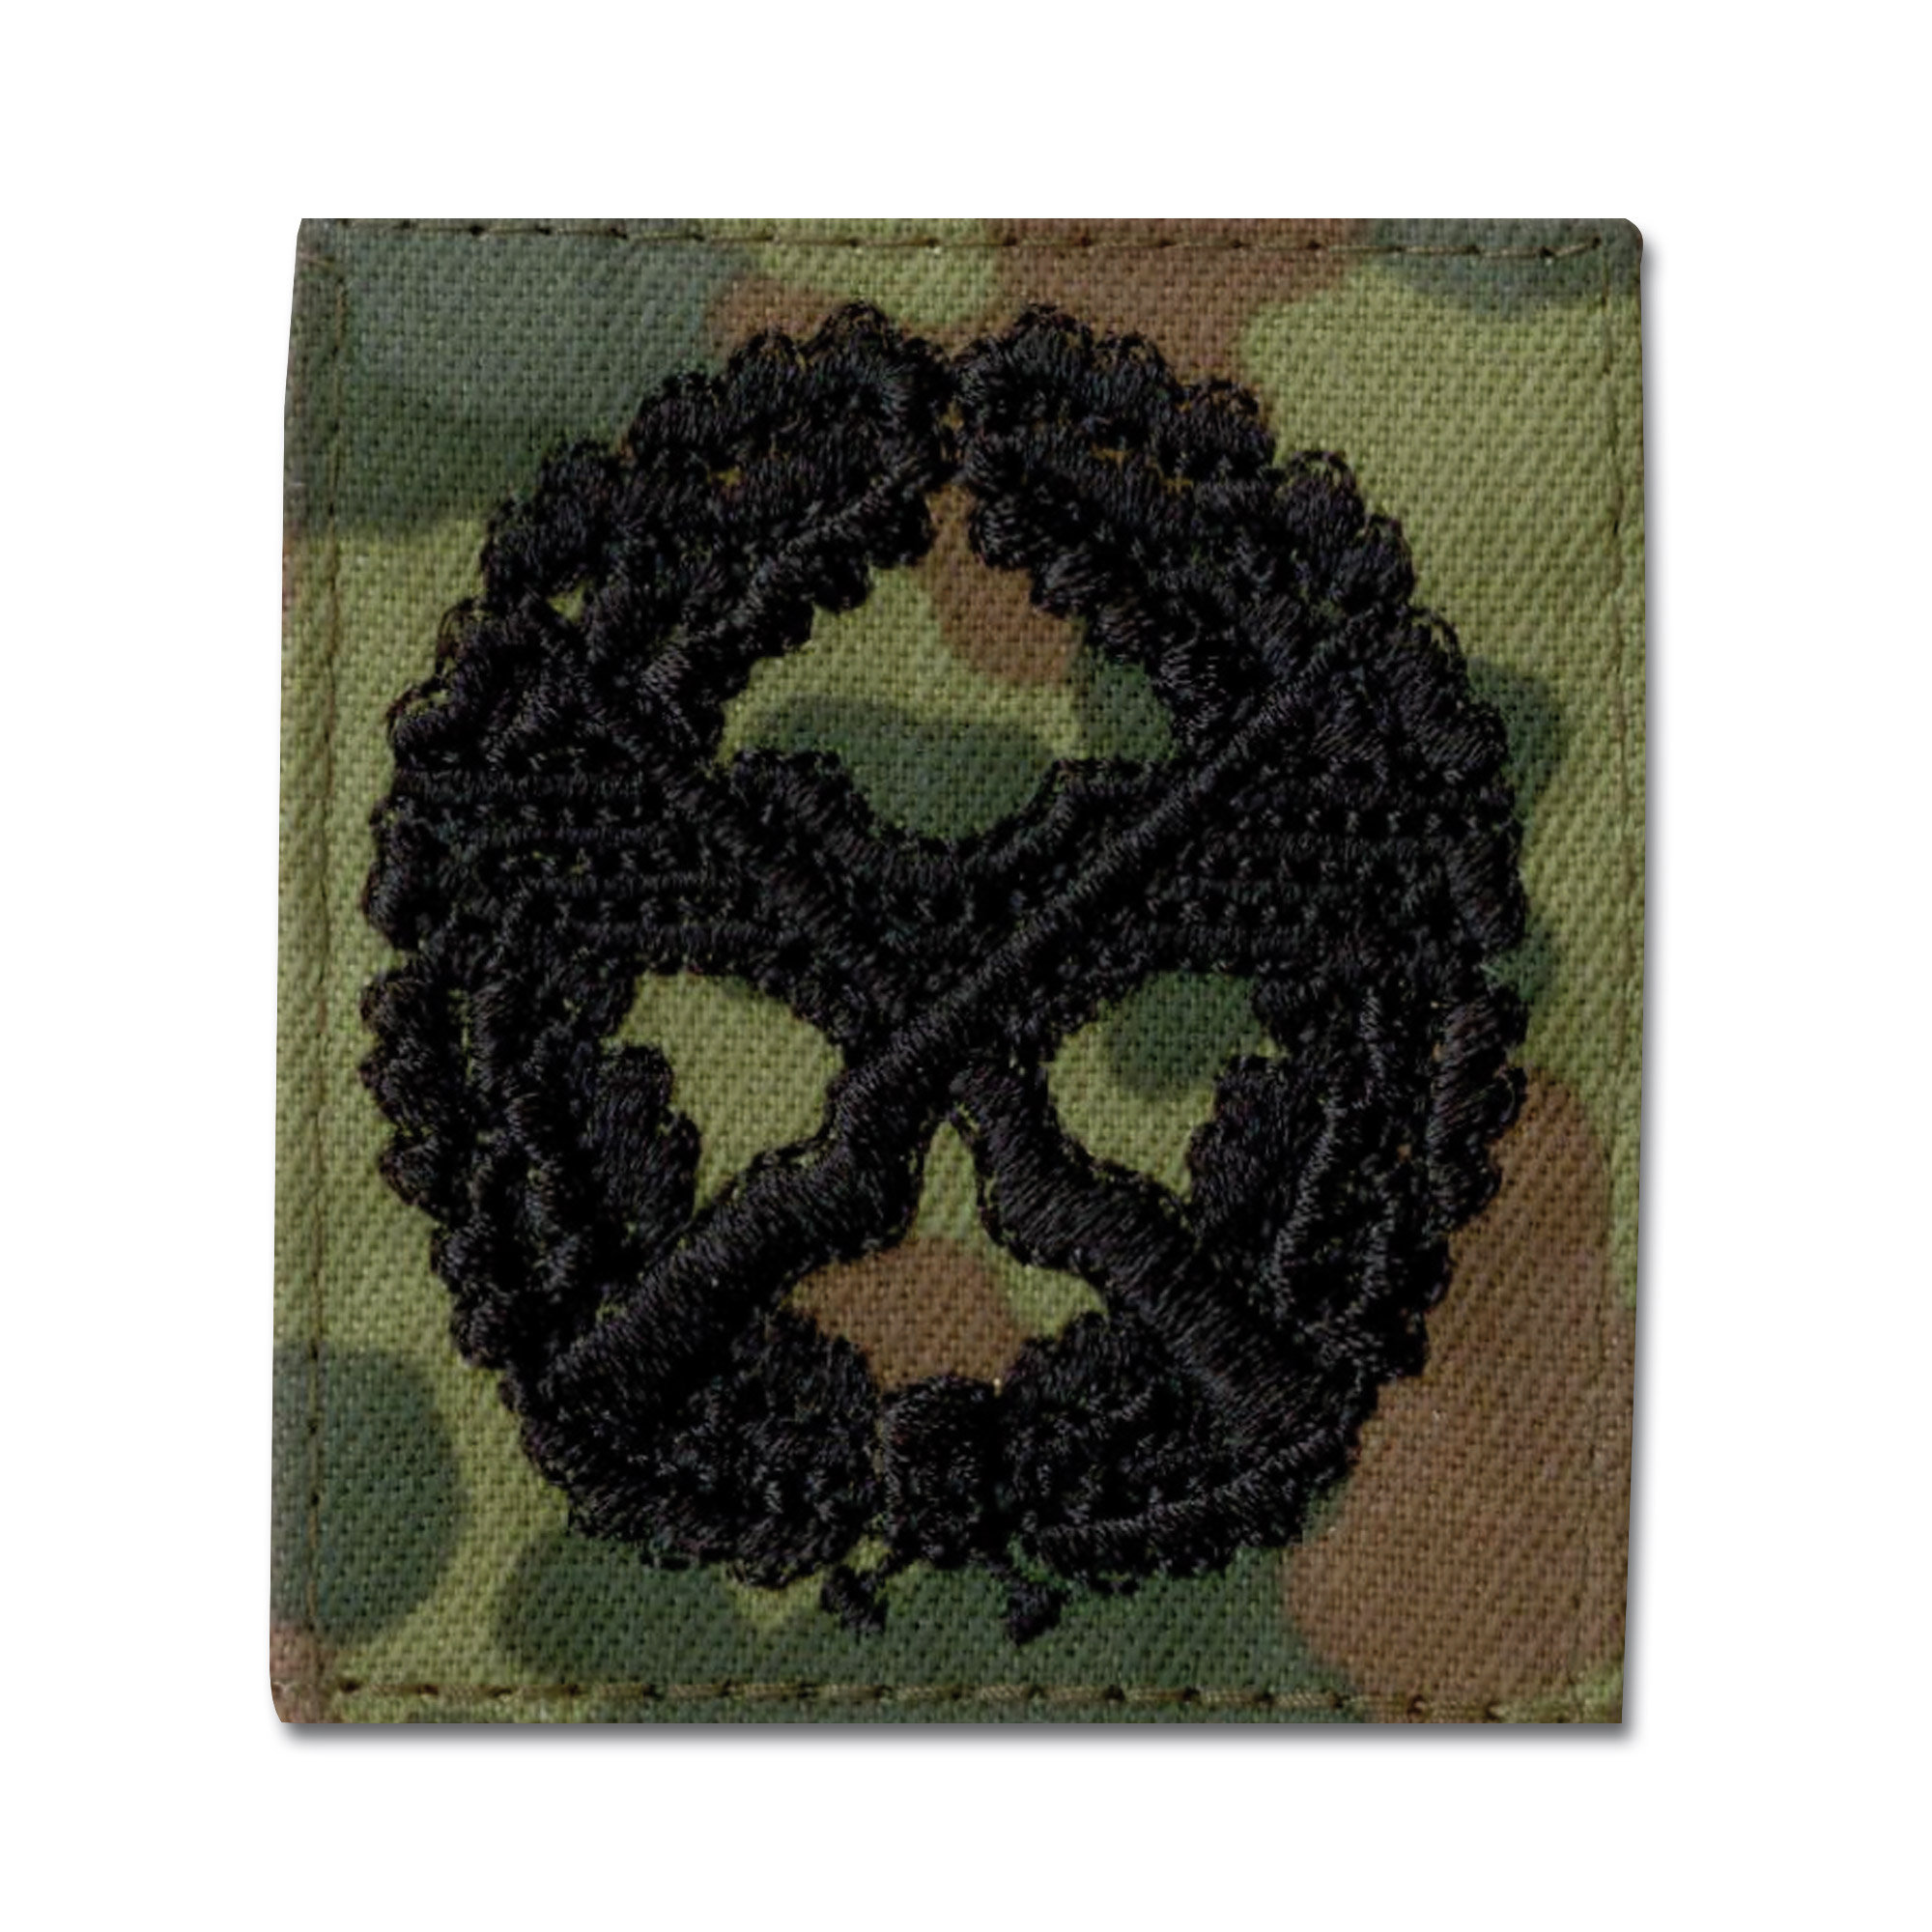 Military Security Troops A.F. flecktarn/black